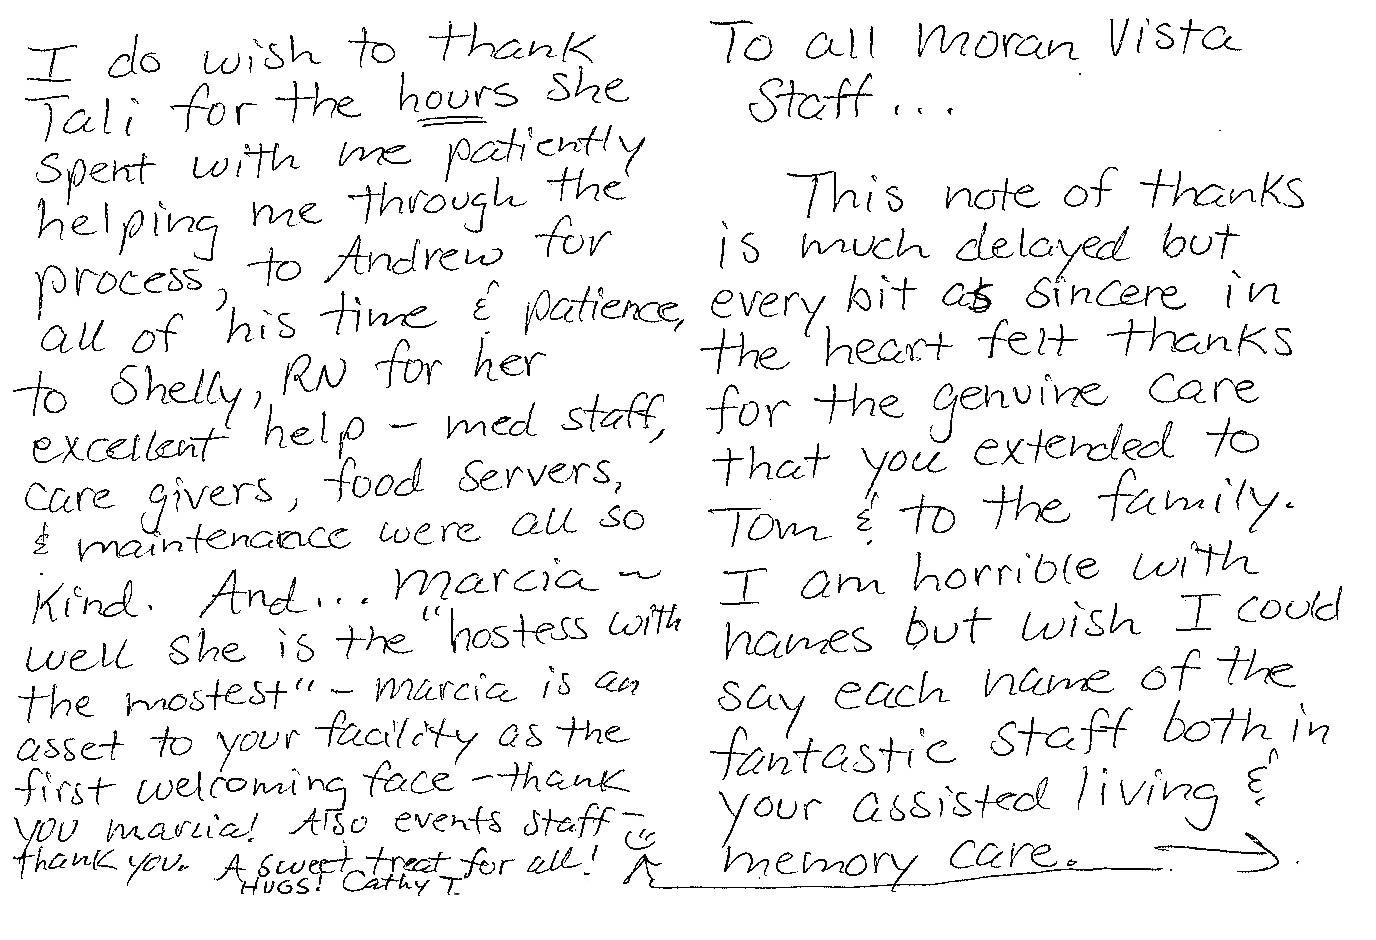 thank you note to Moran Vista